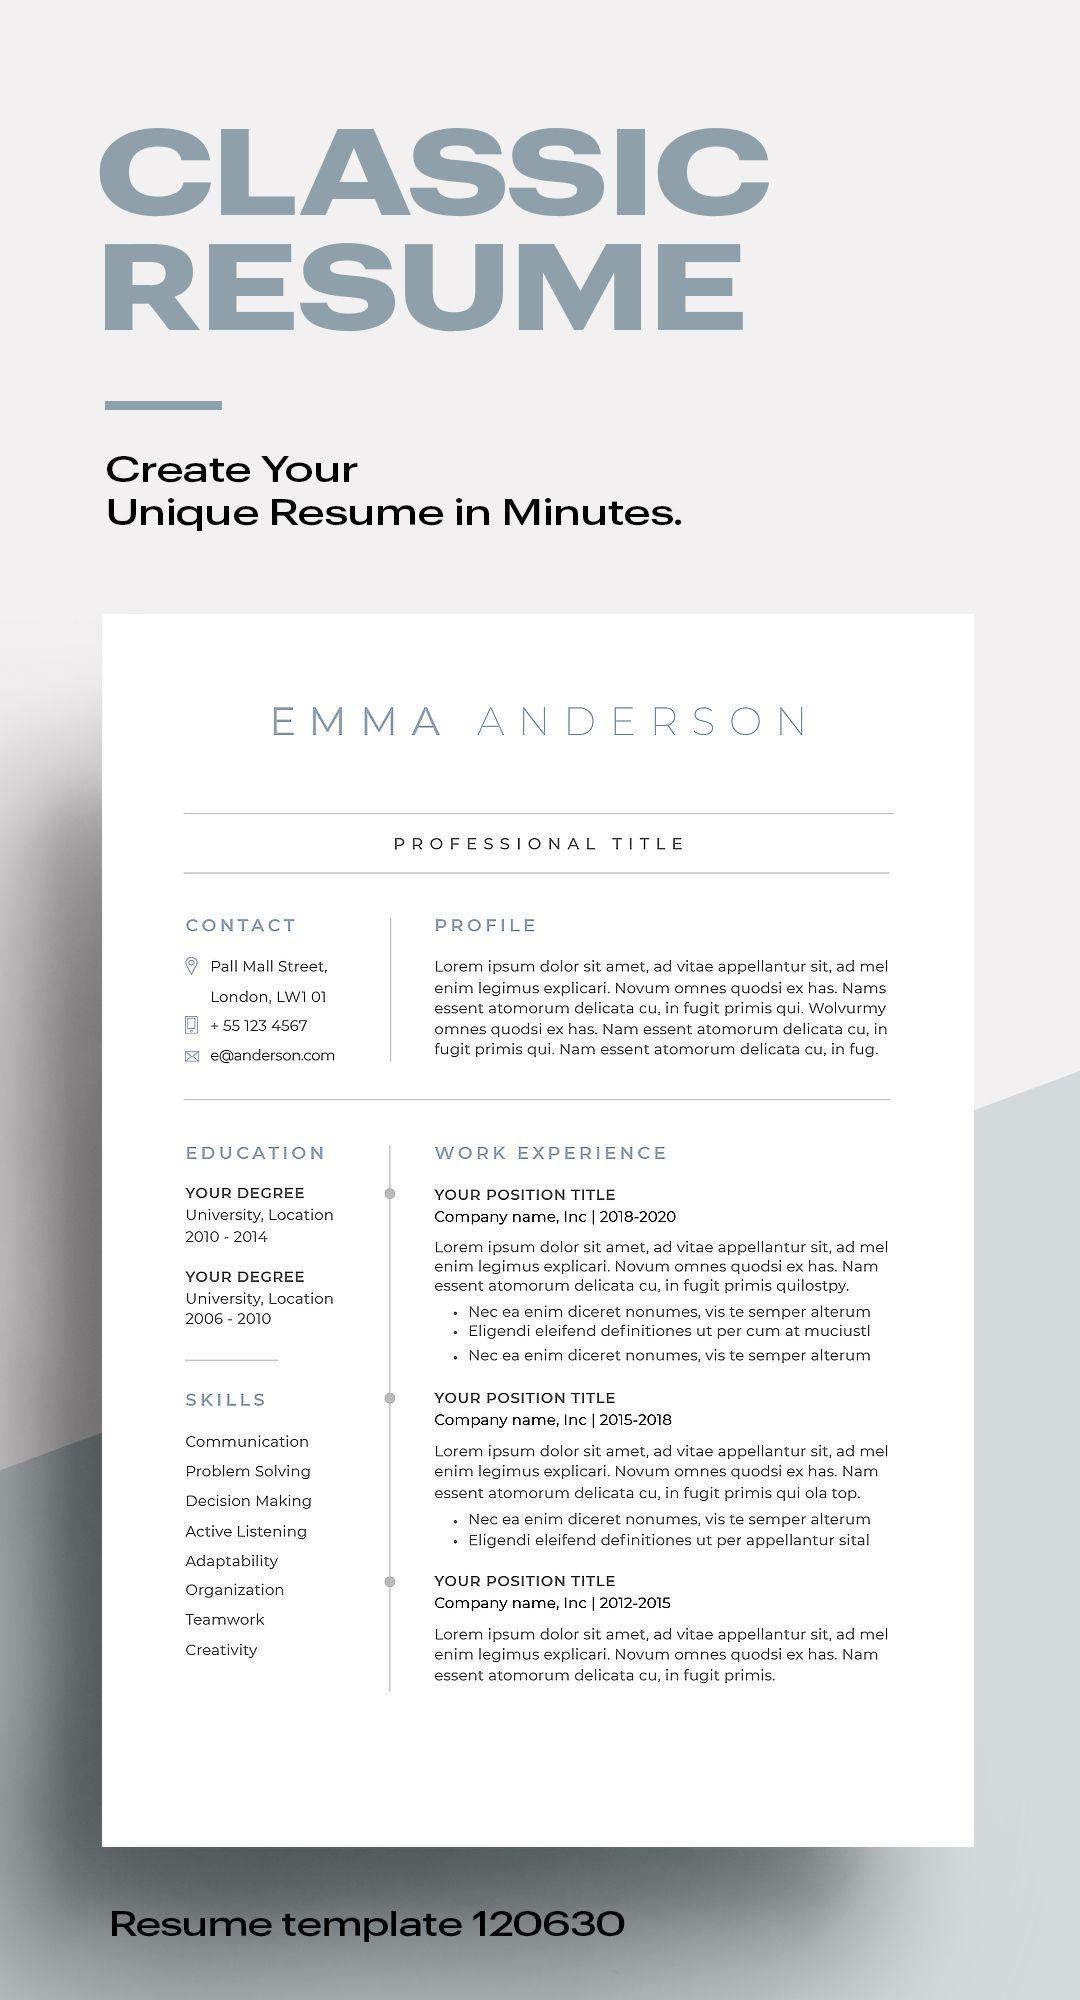 Classic resume template 120630 blue modern resume